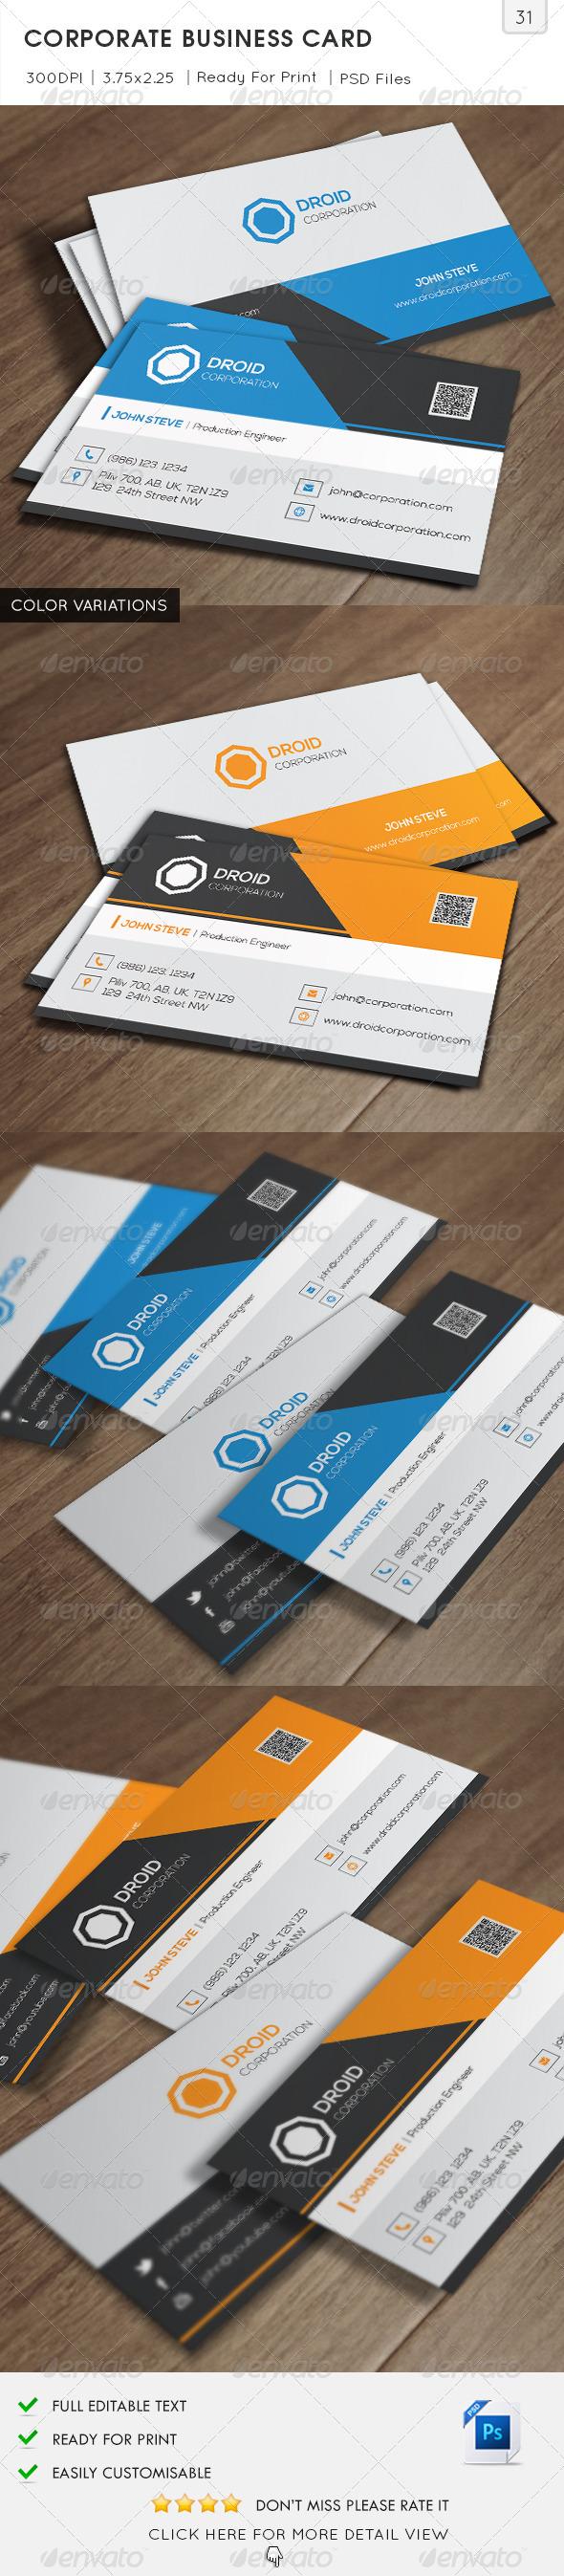 Corporate Business Card v31 - Corporate Business Cards